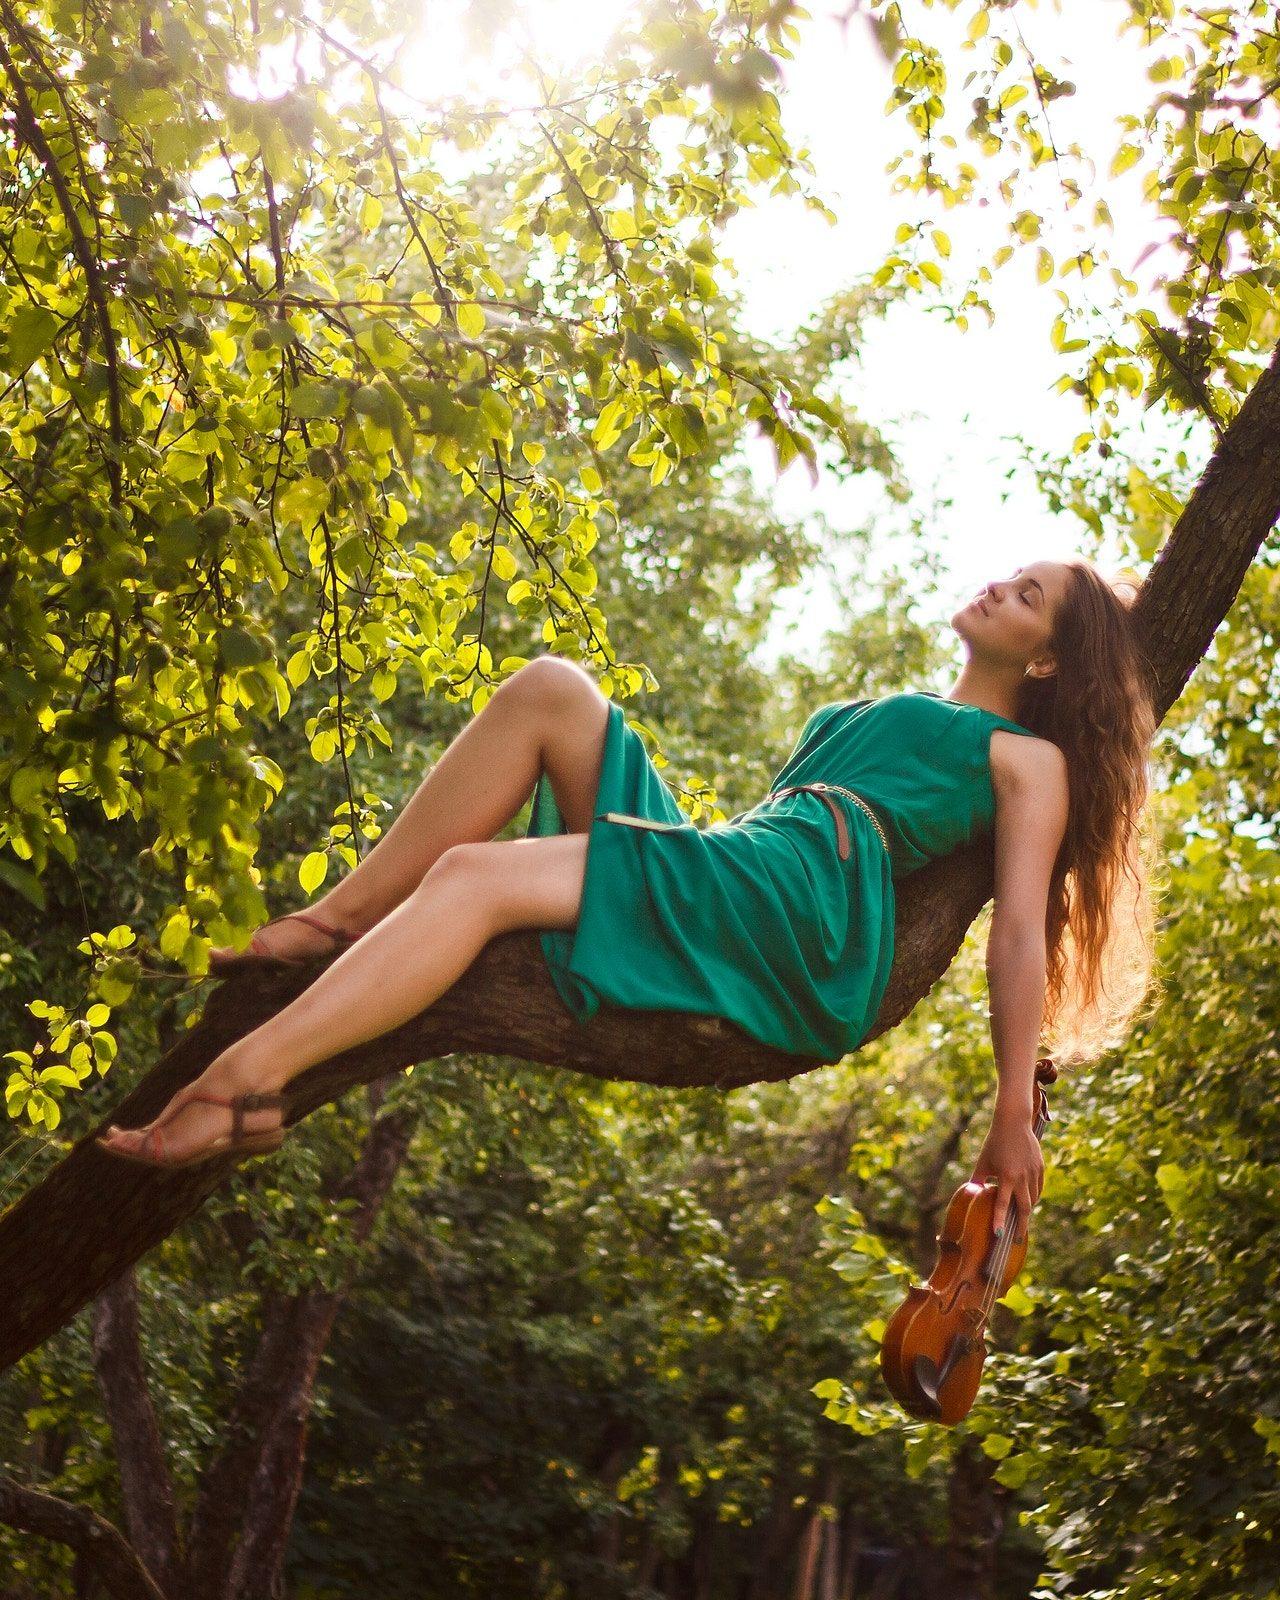 10 Reasons Tired Moms Should Take a Nap Daily